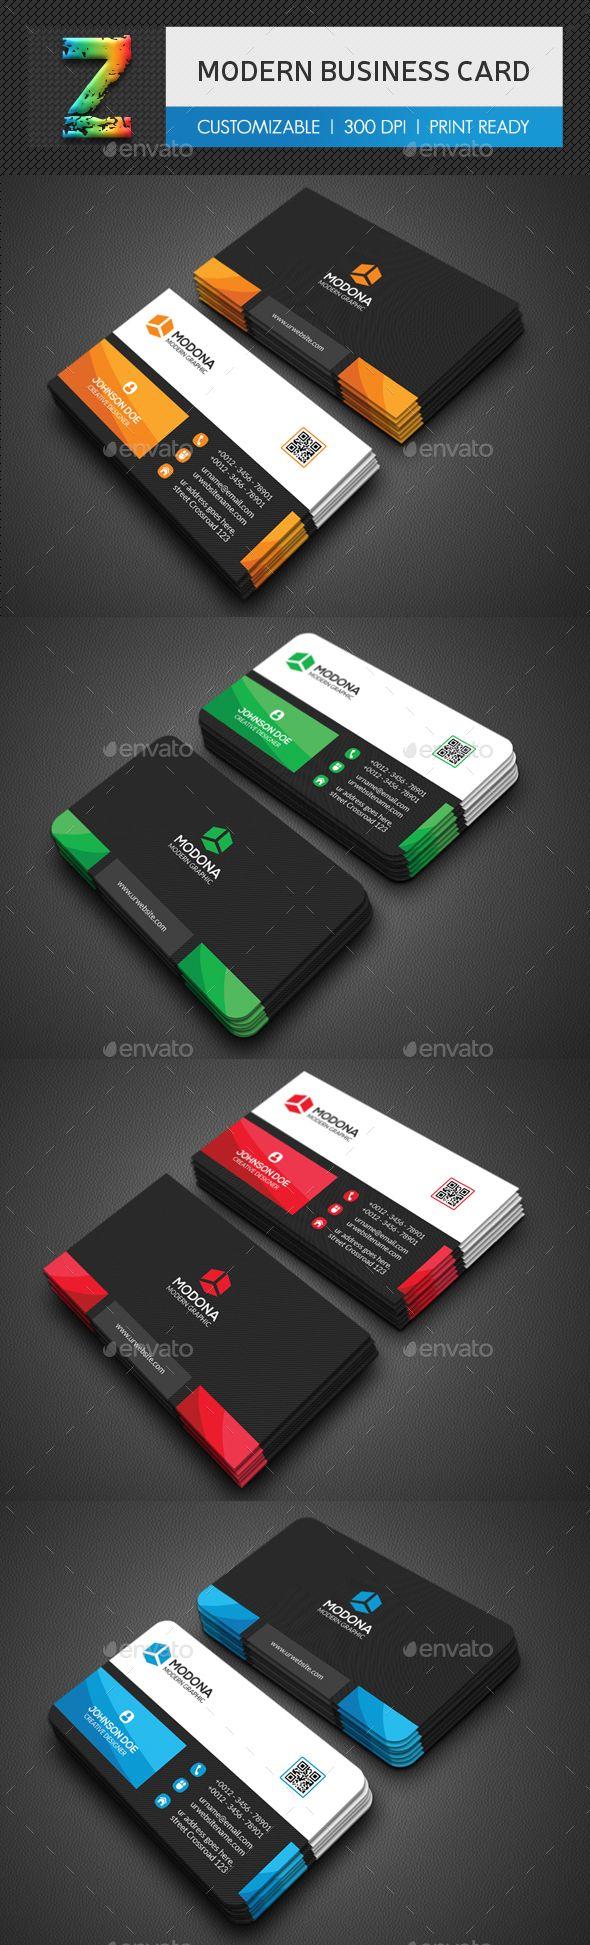 Modern Business Card Template PSD. Download here: http://graphicriver.net/item/modern-business-card/16438628?ref=ksioks